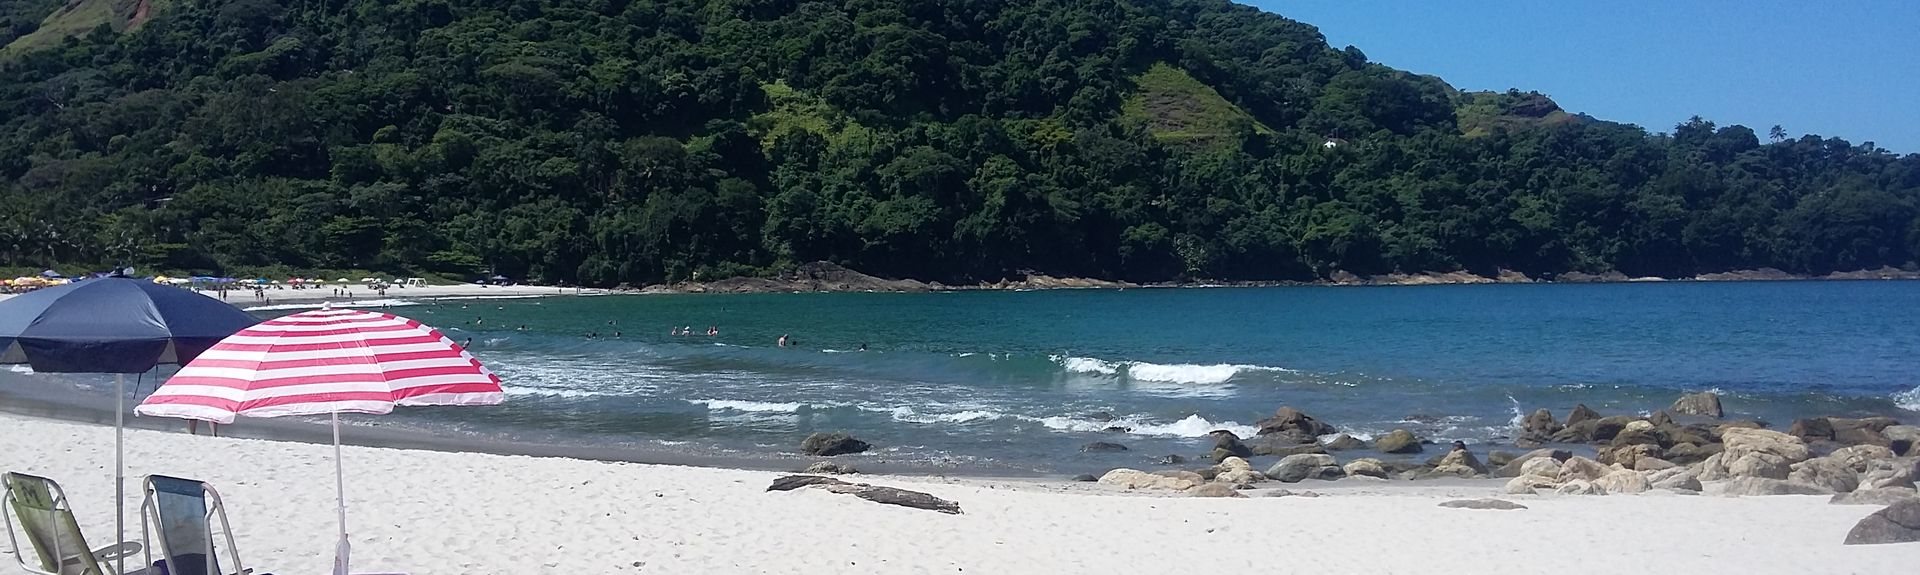 Brava Beach, Sao Sebastiao, Southeast Region, Brazil